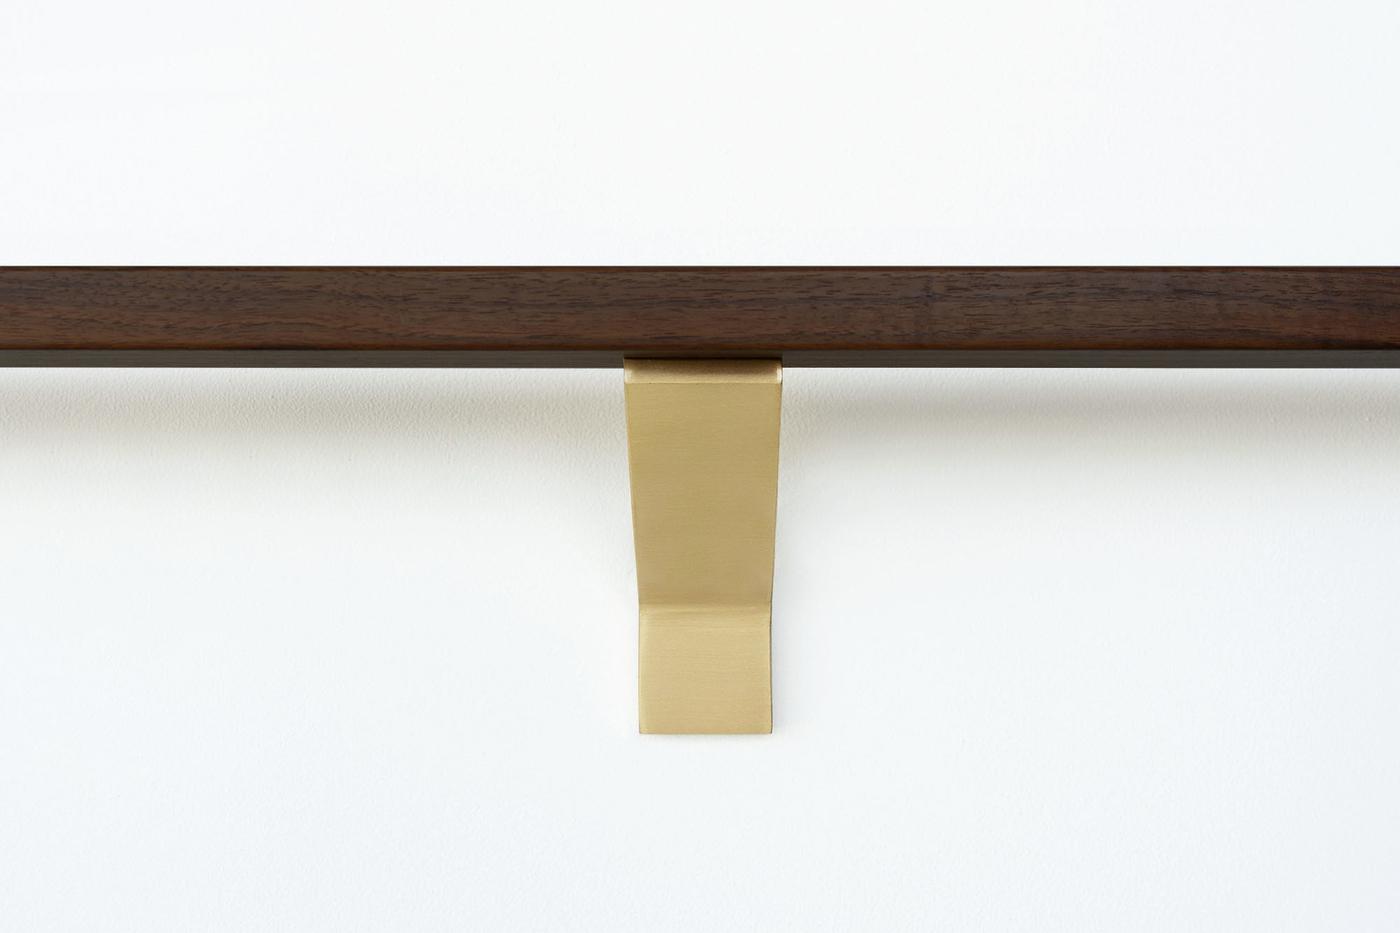 Brushed-brass-handrail-bracket